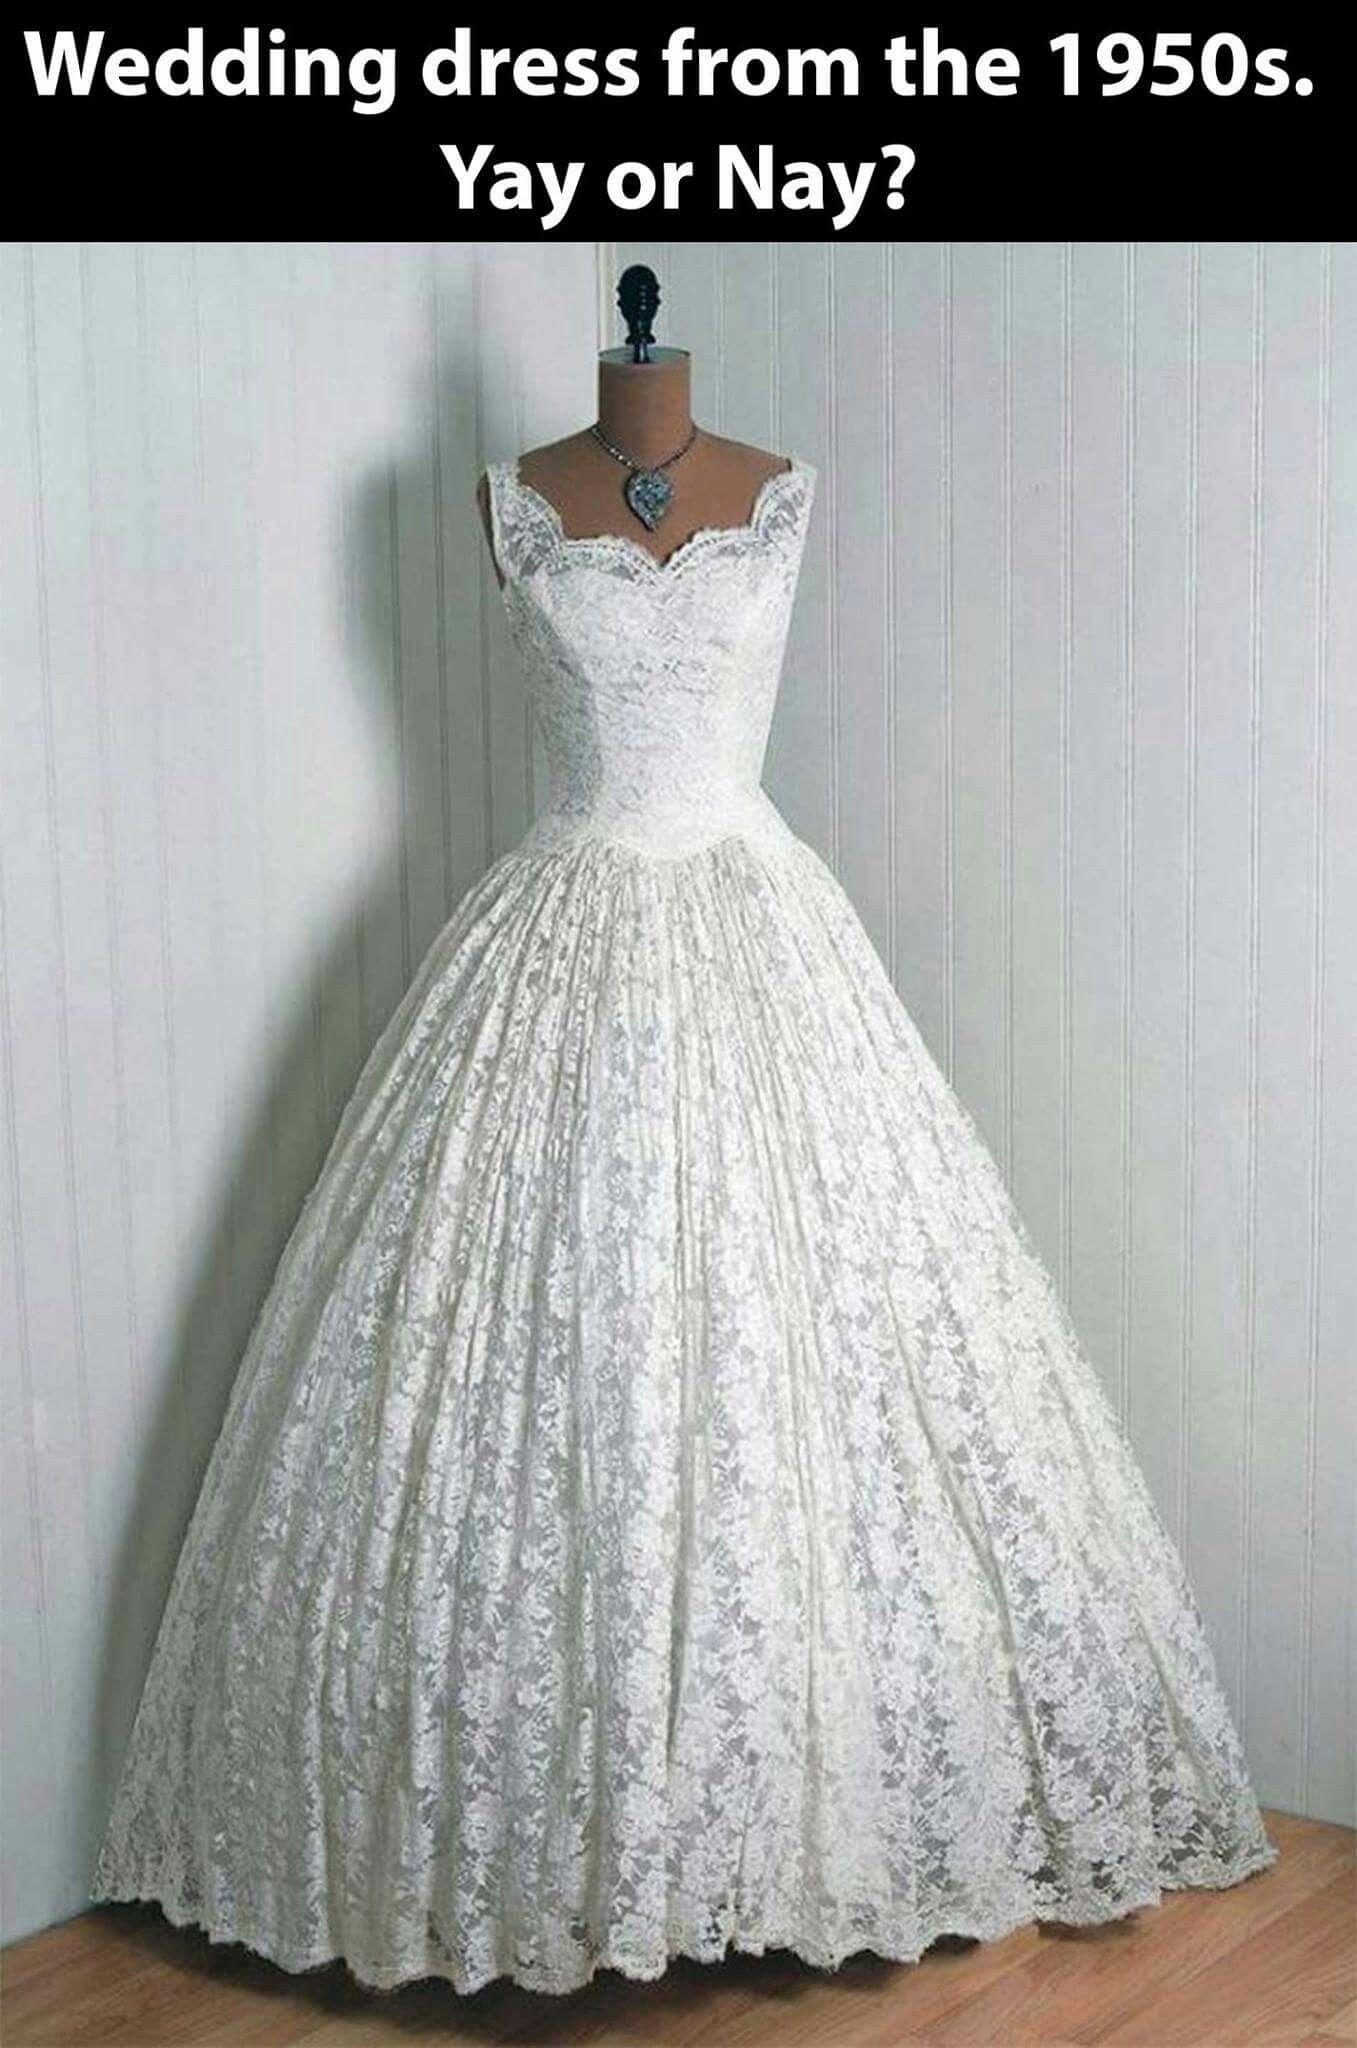 Pin by melissa davis on love this style pinterest wedding dress